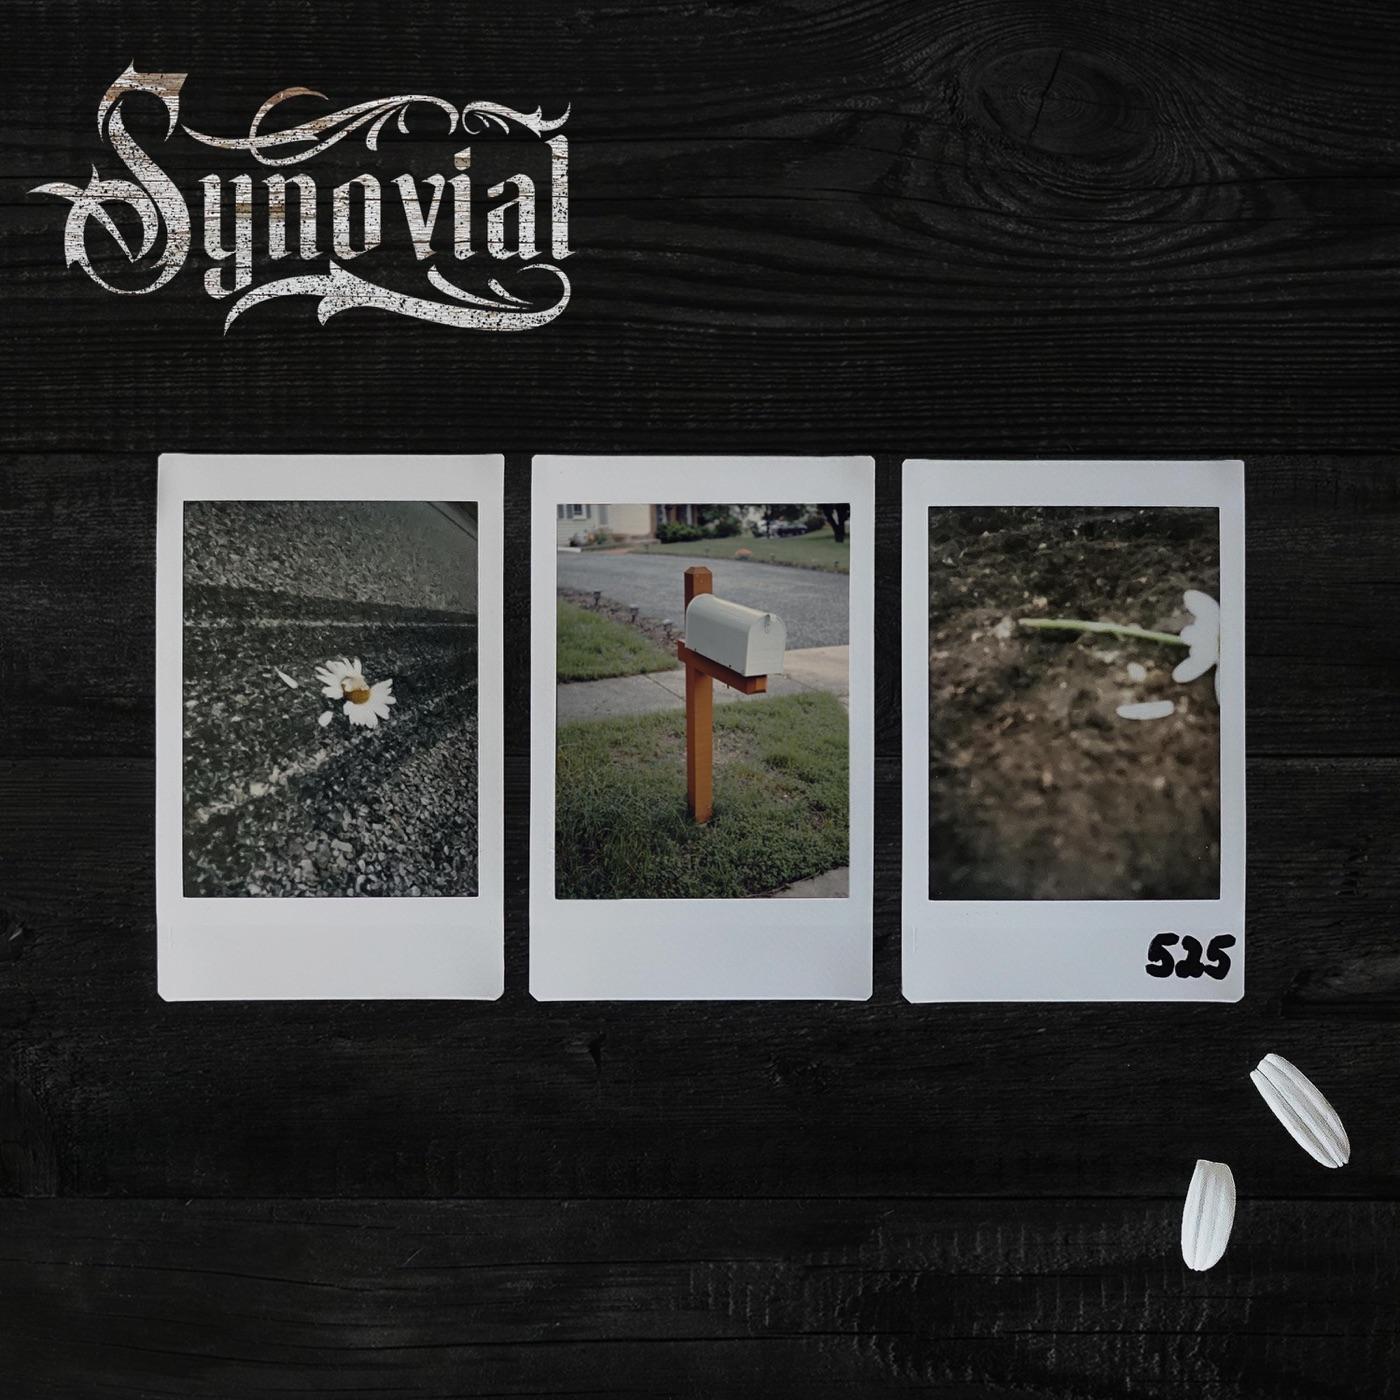 Synovial - 525 [single] (2018)